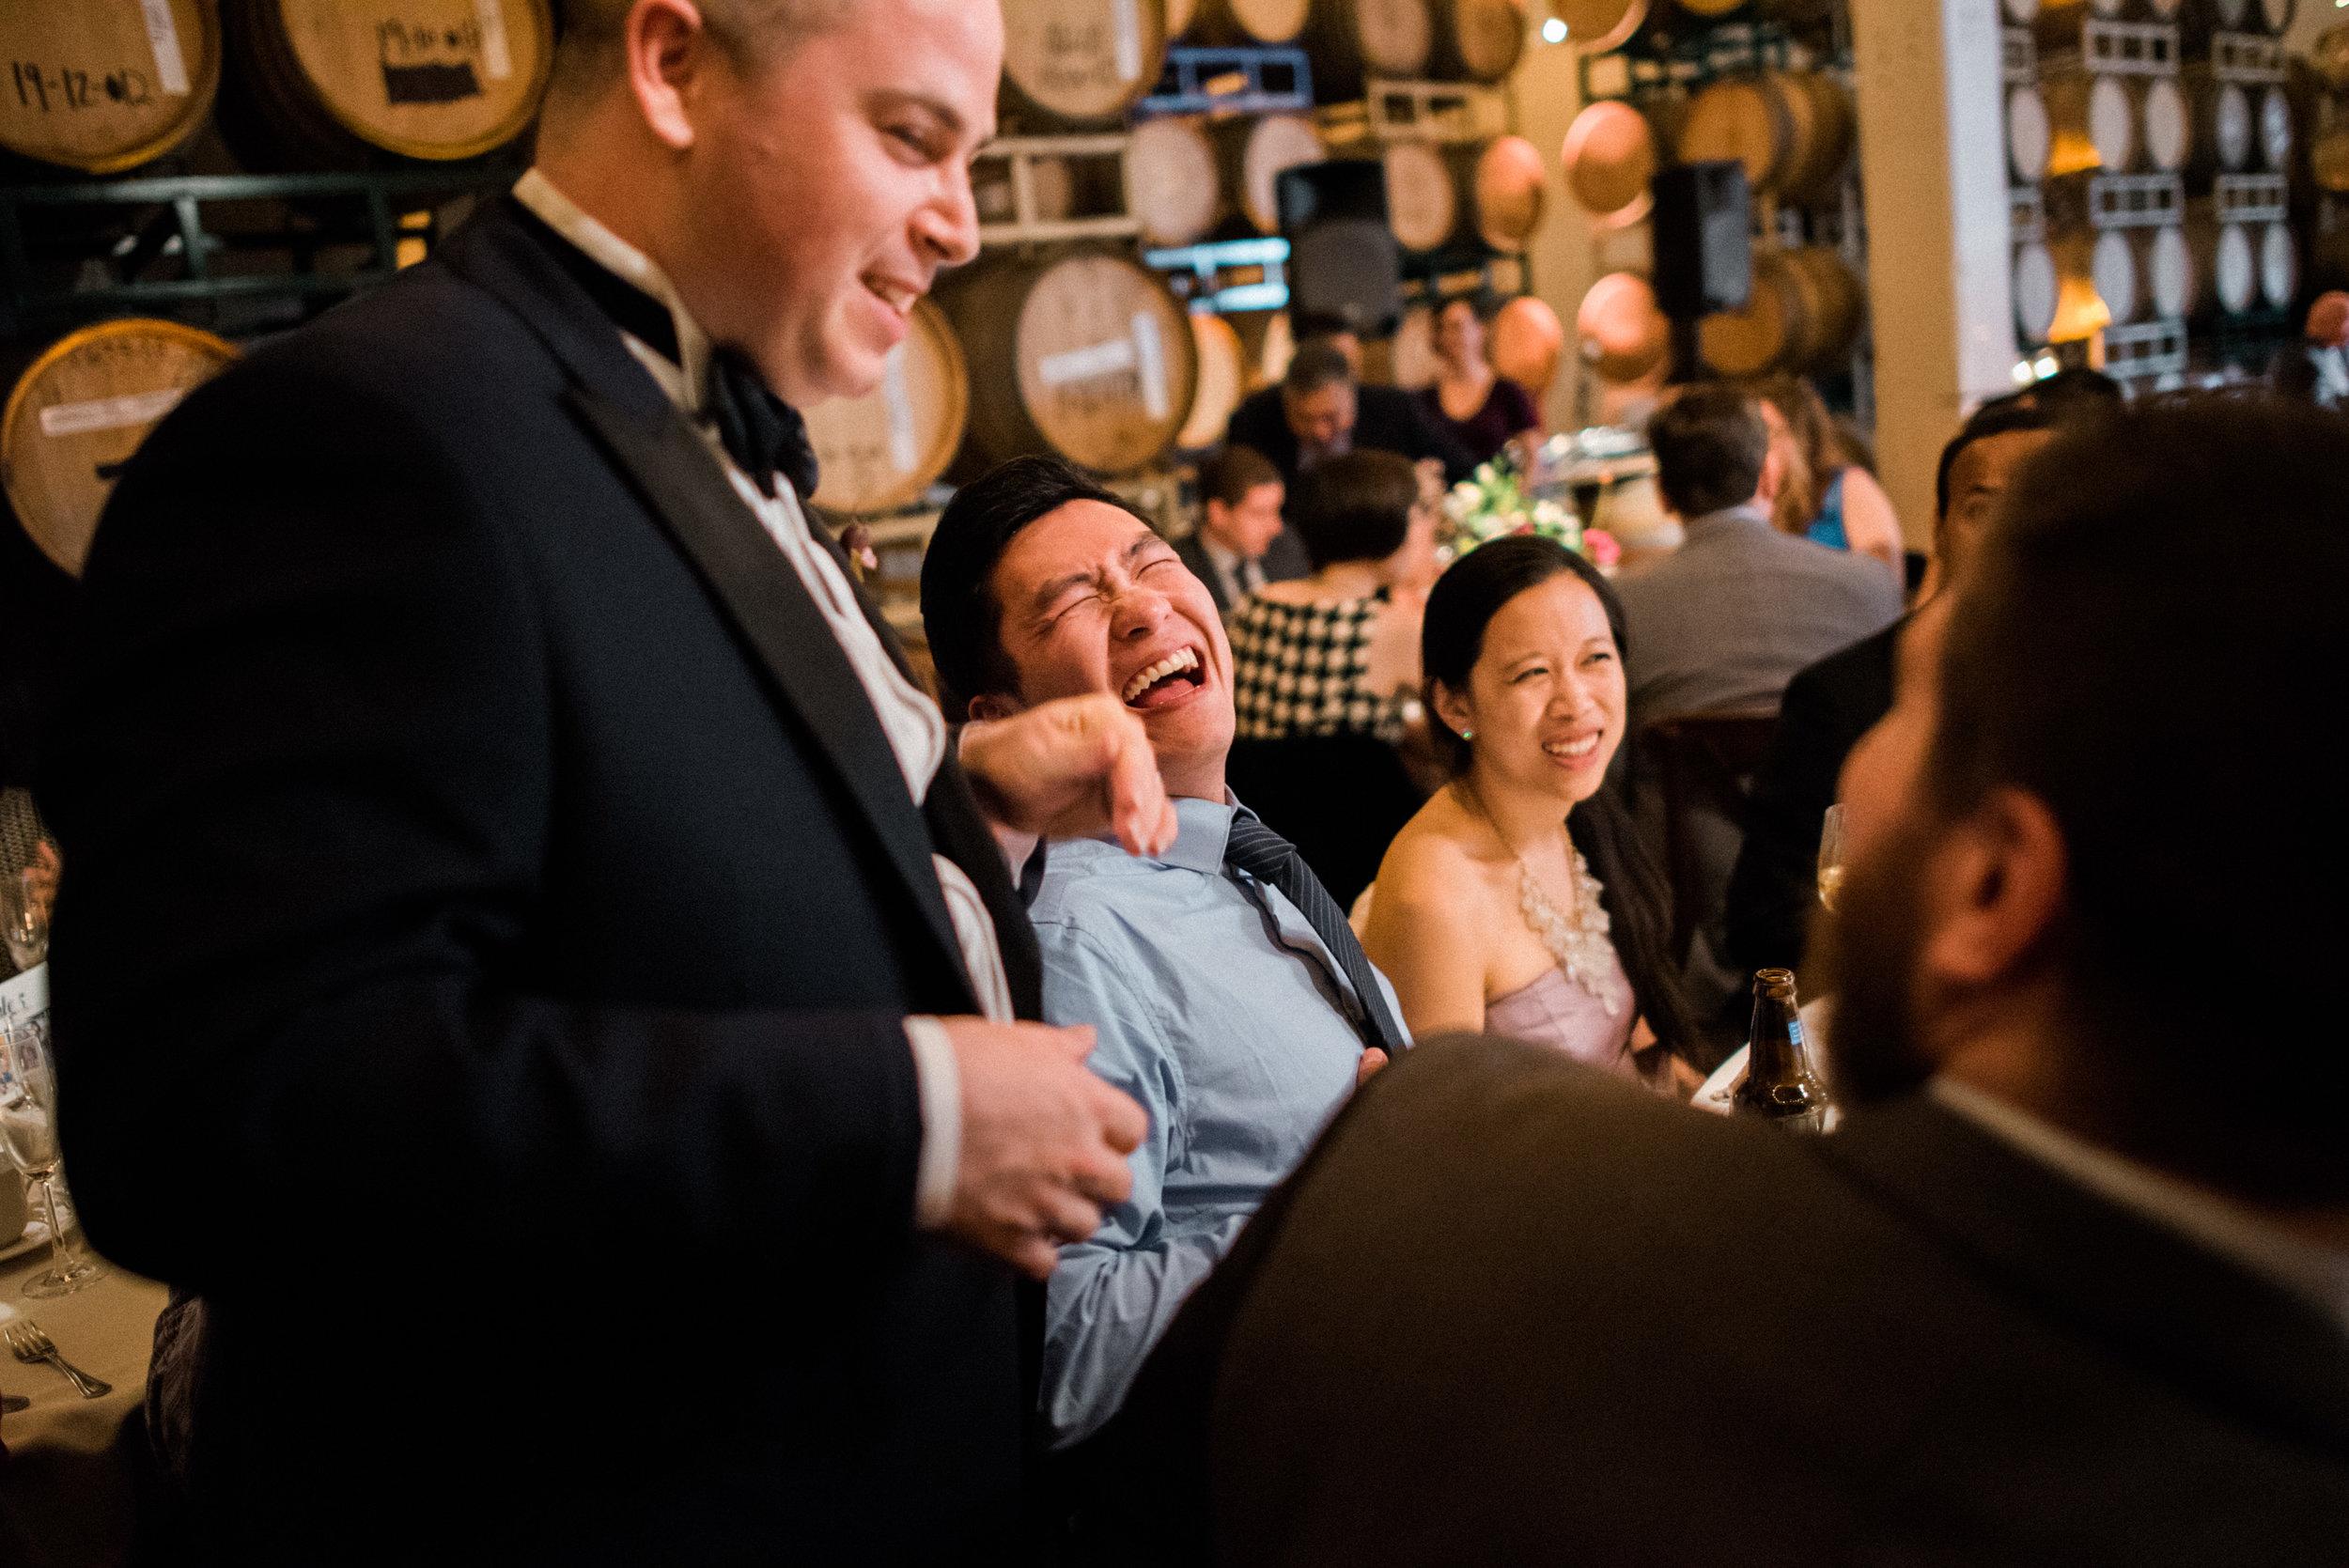 Swedenborgian Church Dogpatch Winery Wedding075.jpg